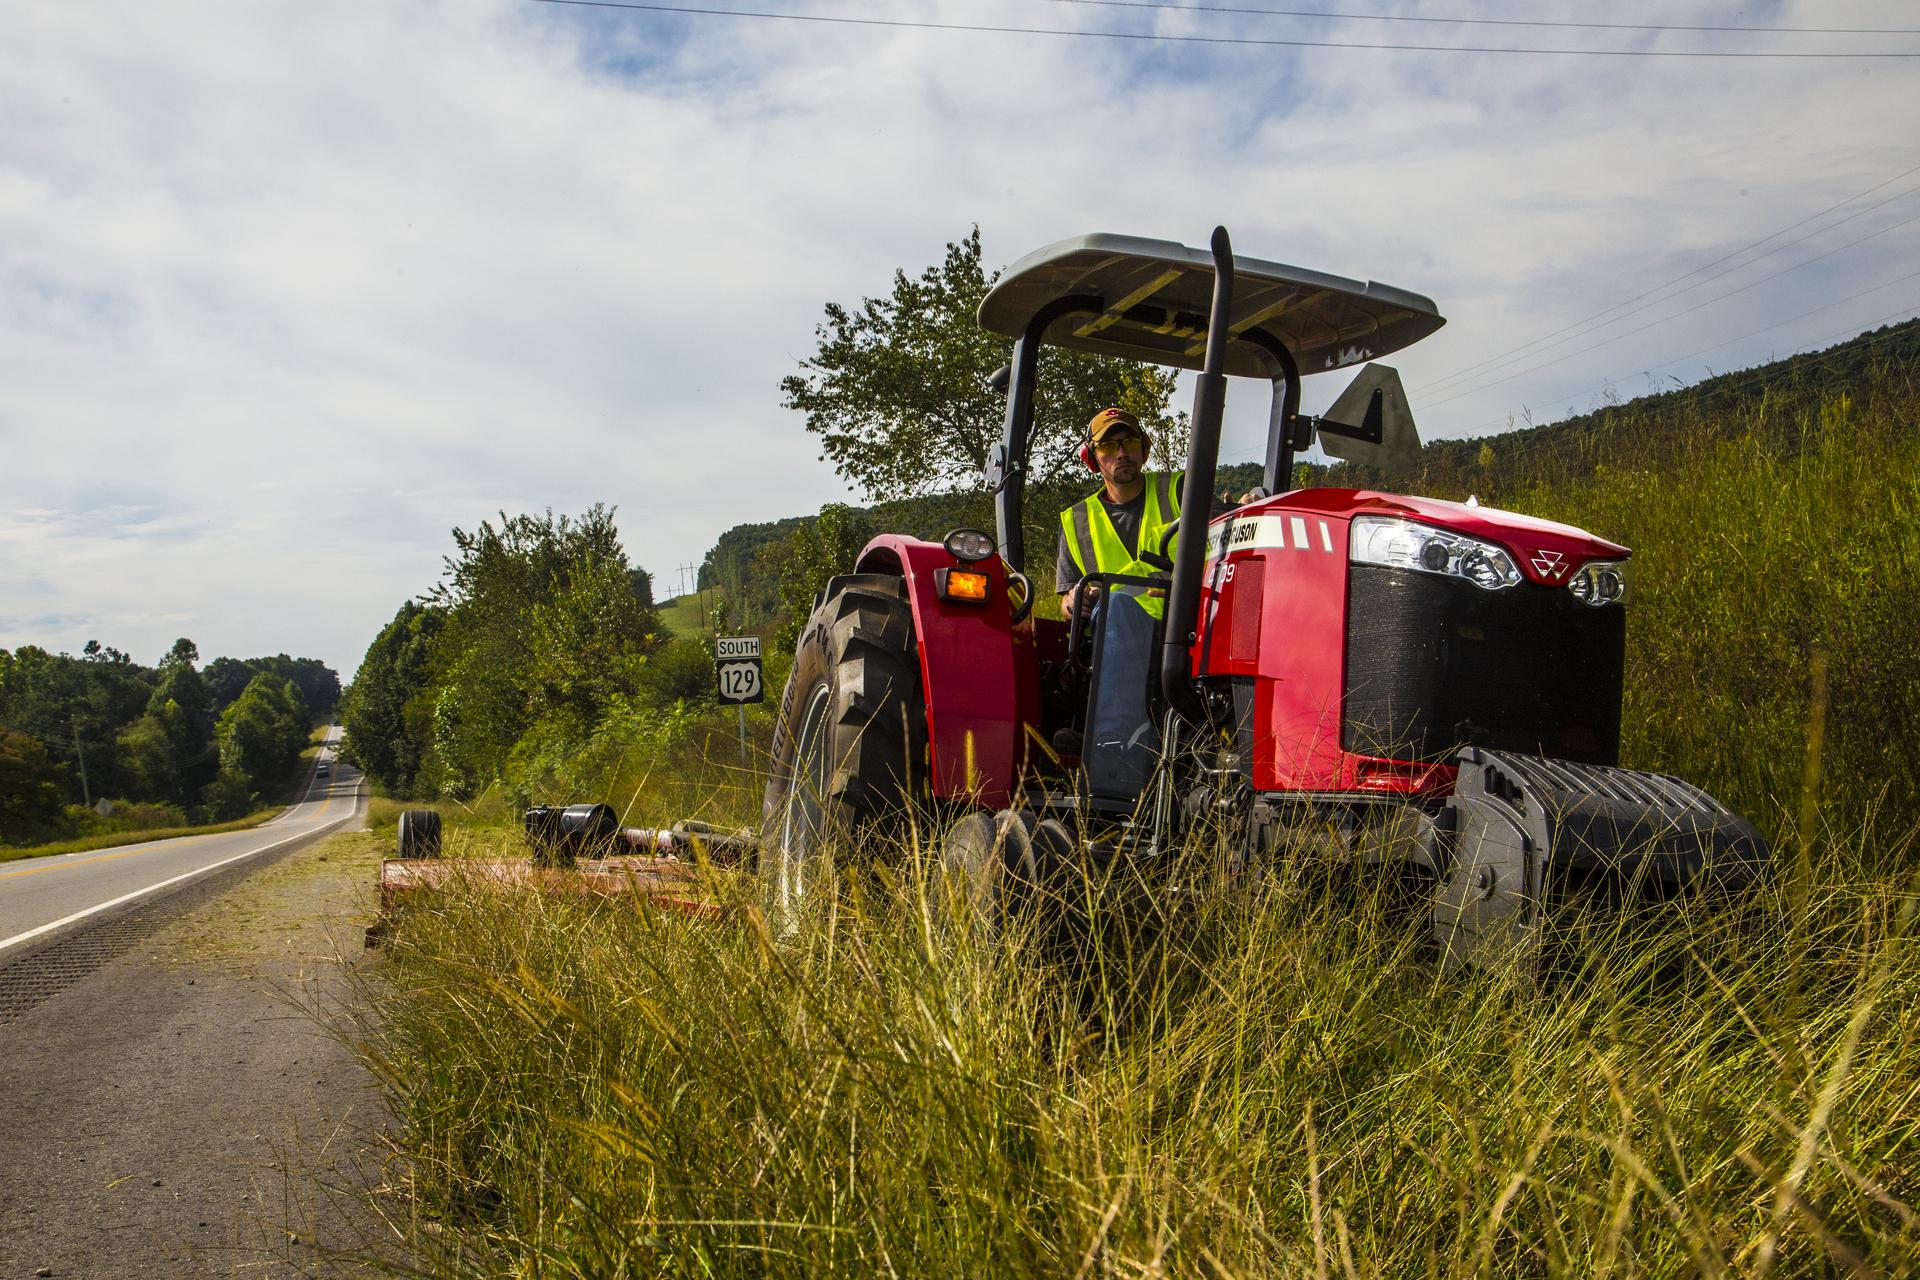 Massey Ferguson 4700 Series Utility Tractor